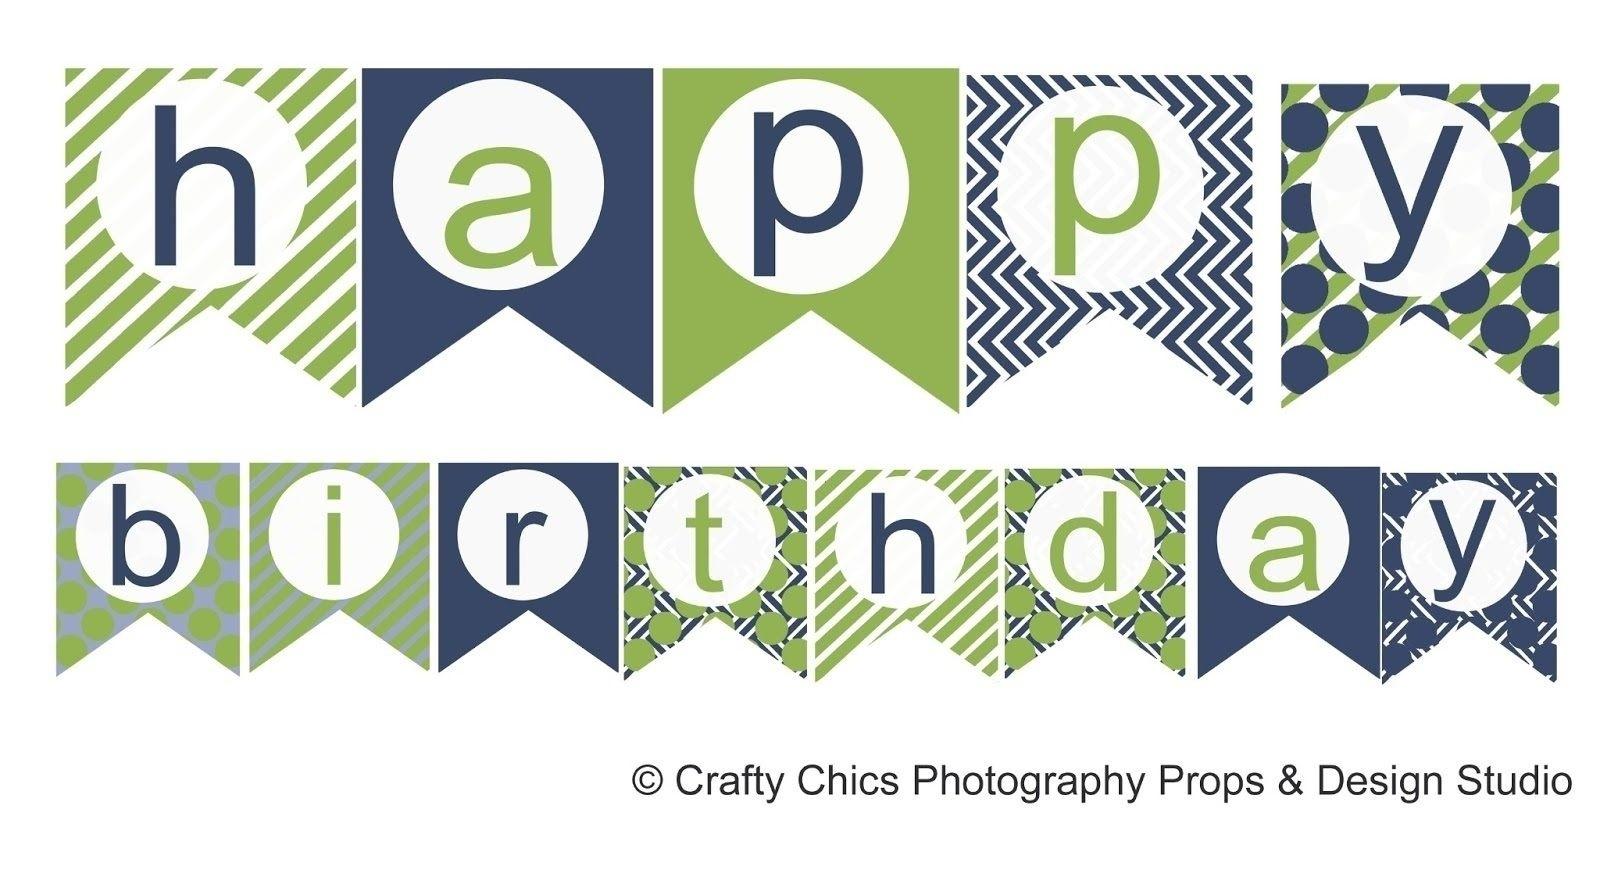 Happy Birthday Banner Template Printable | World Of Label - Birthday Banner Templates Free Printable